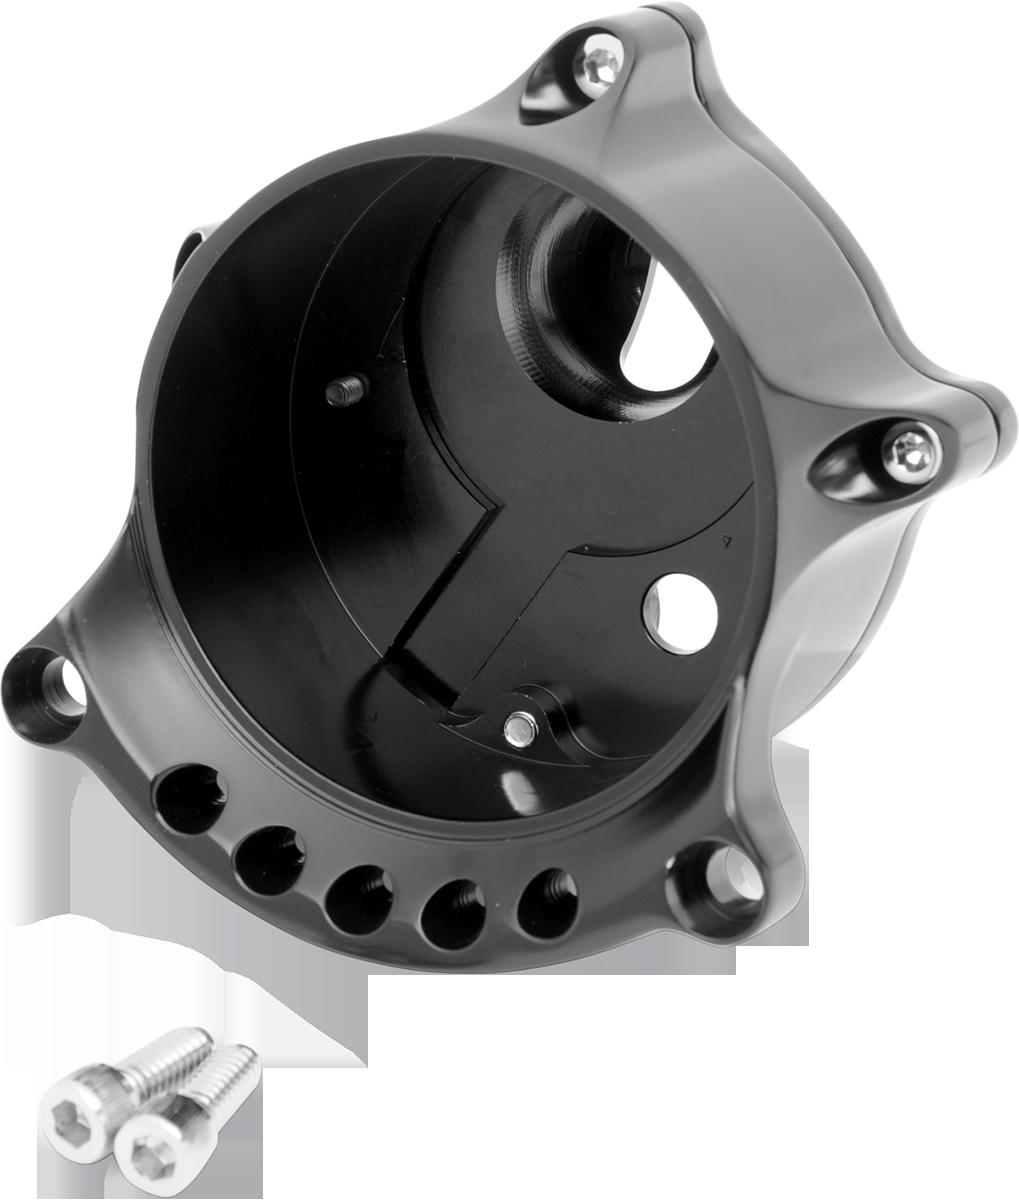 RSD Black Cafe Speeo Speedometer Mounting Bracket For 95-19 Harley Sportster XL